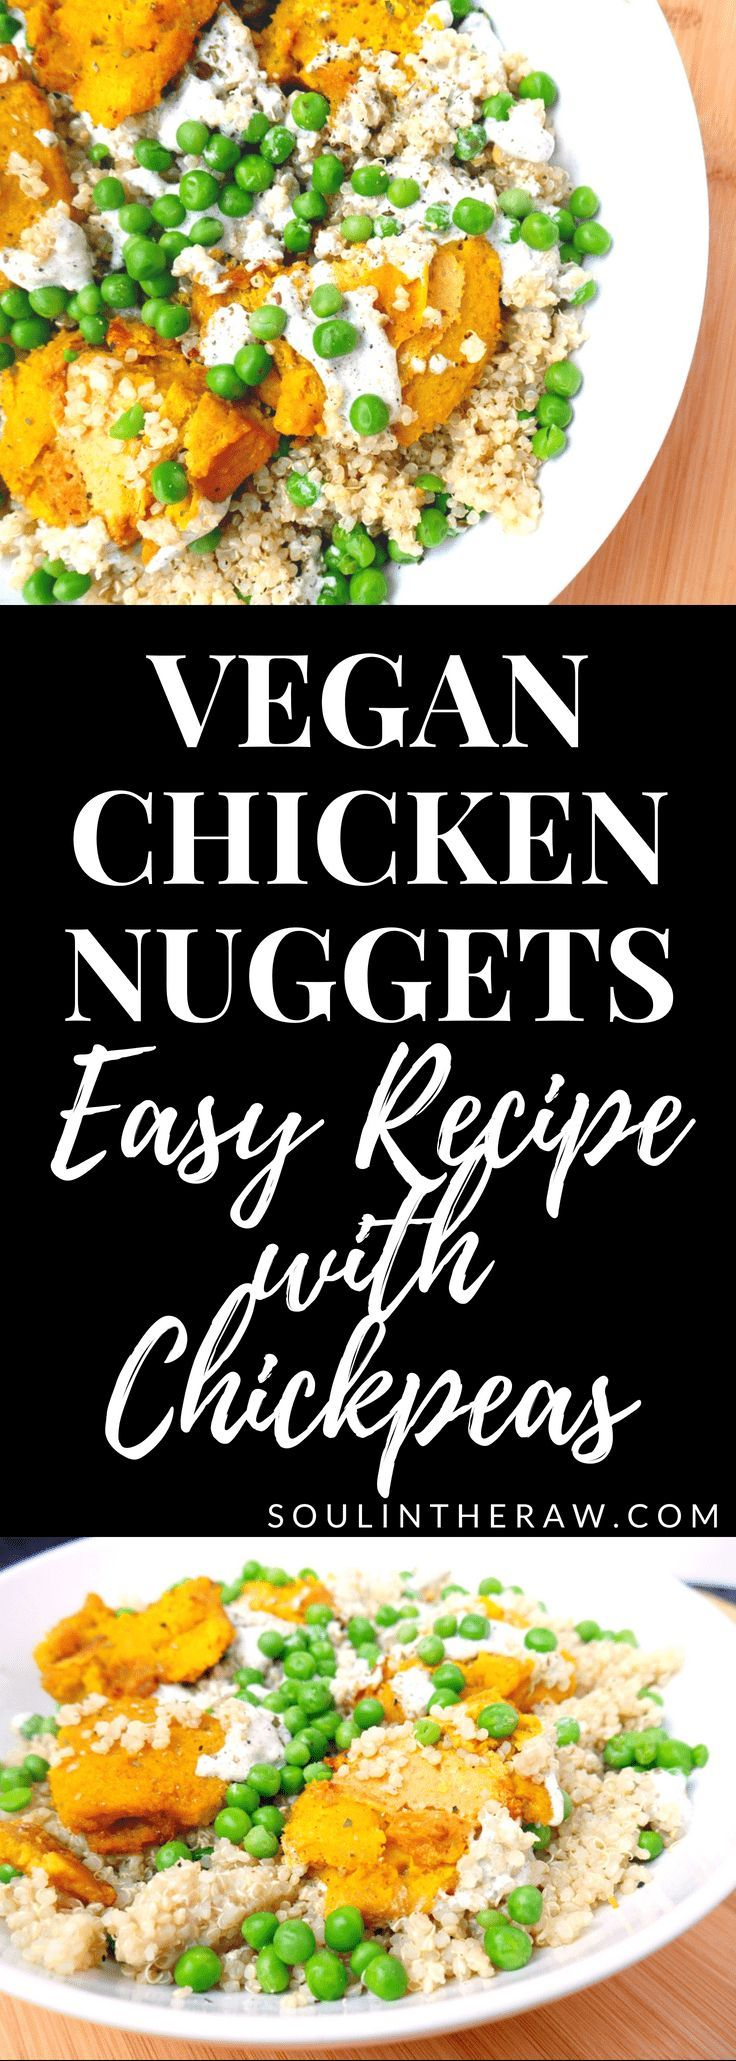 Easy Raw Vegan Recipes